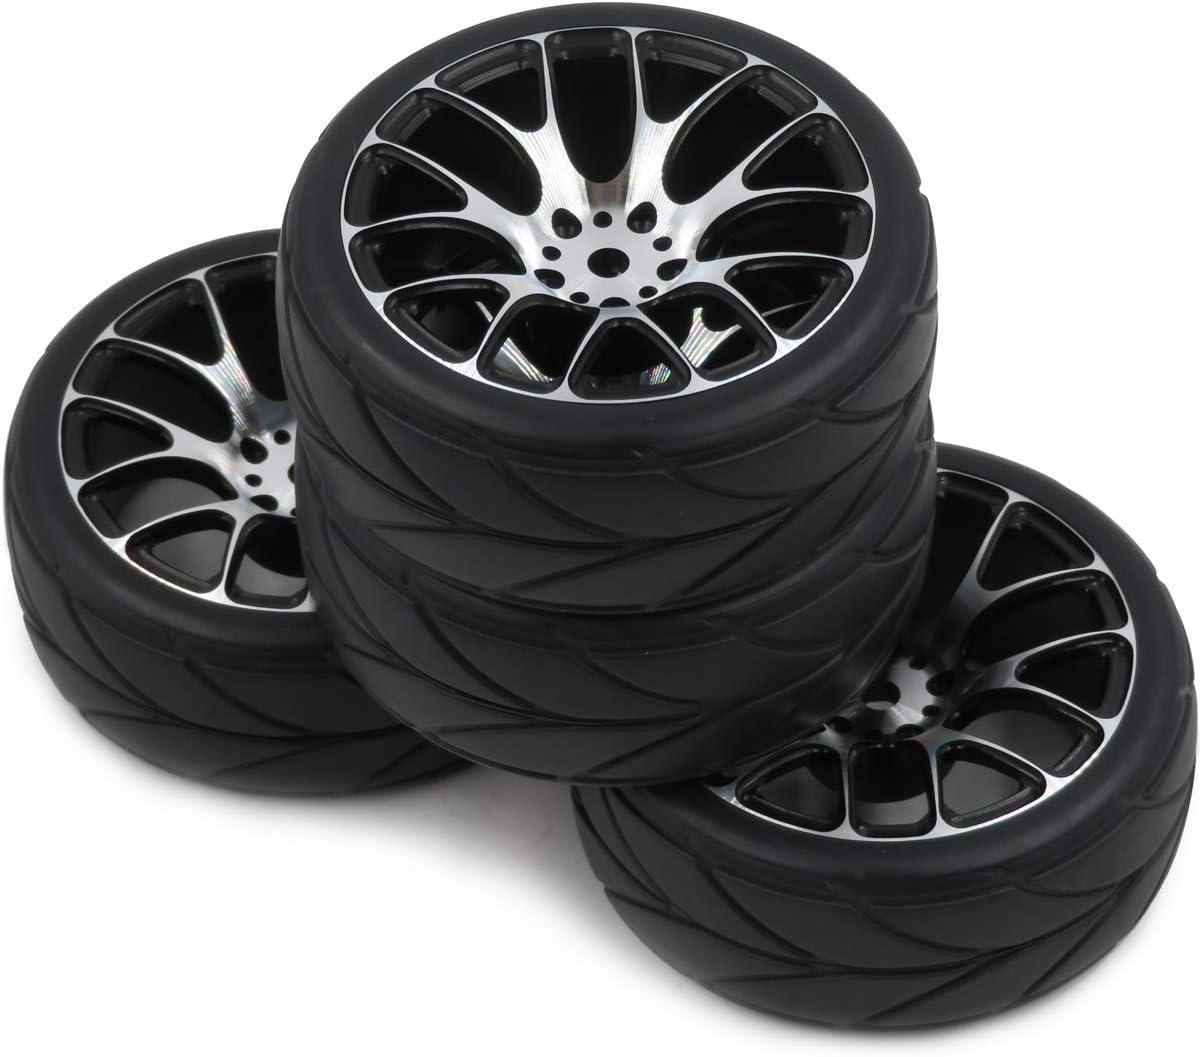 Aluminium Alloy Wheel Rim for RC 1:10 On-Road Car Accessory Set of 4